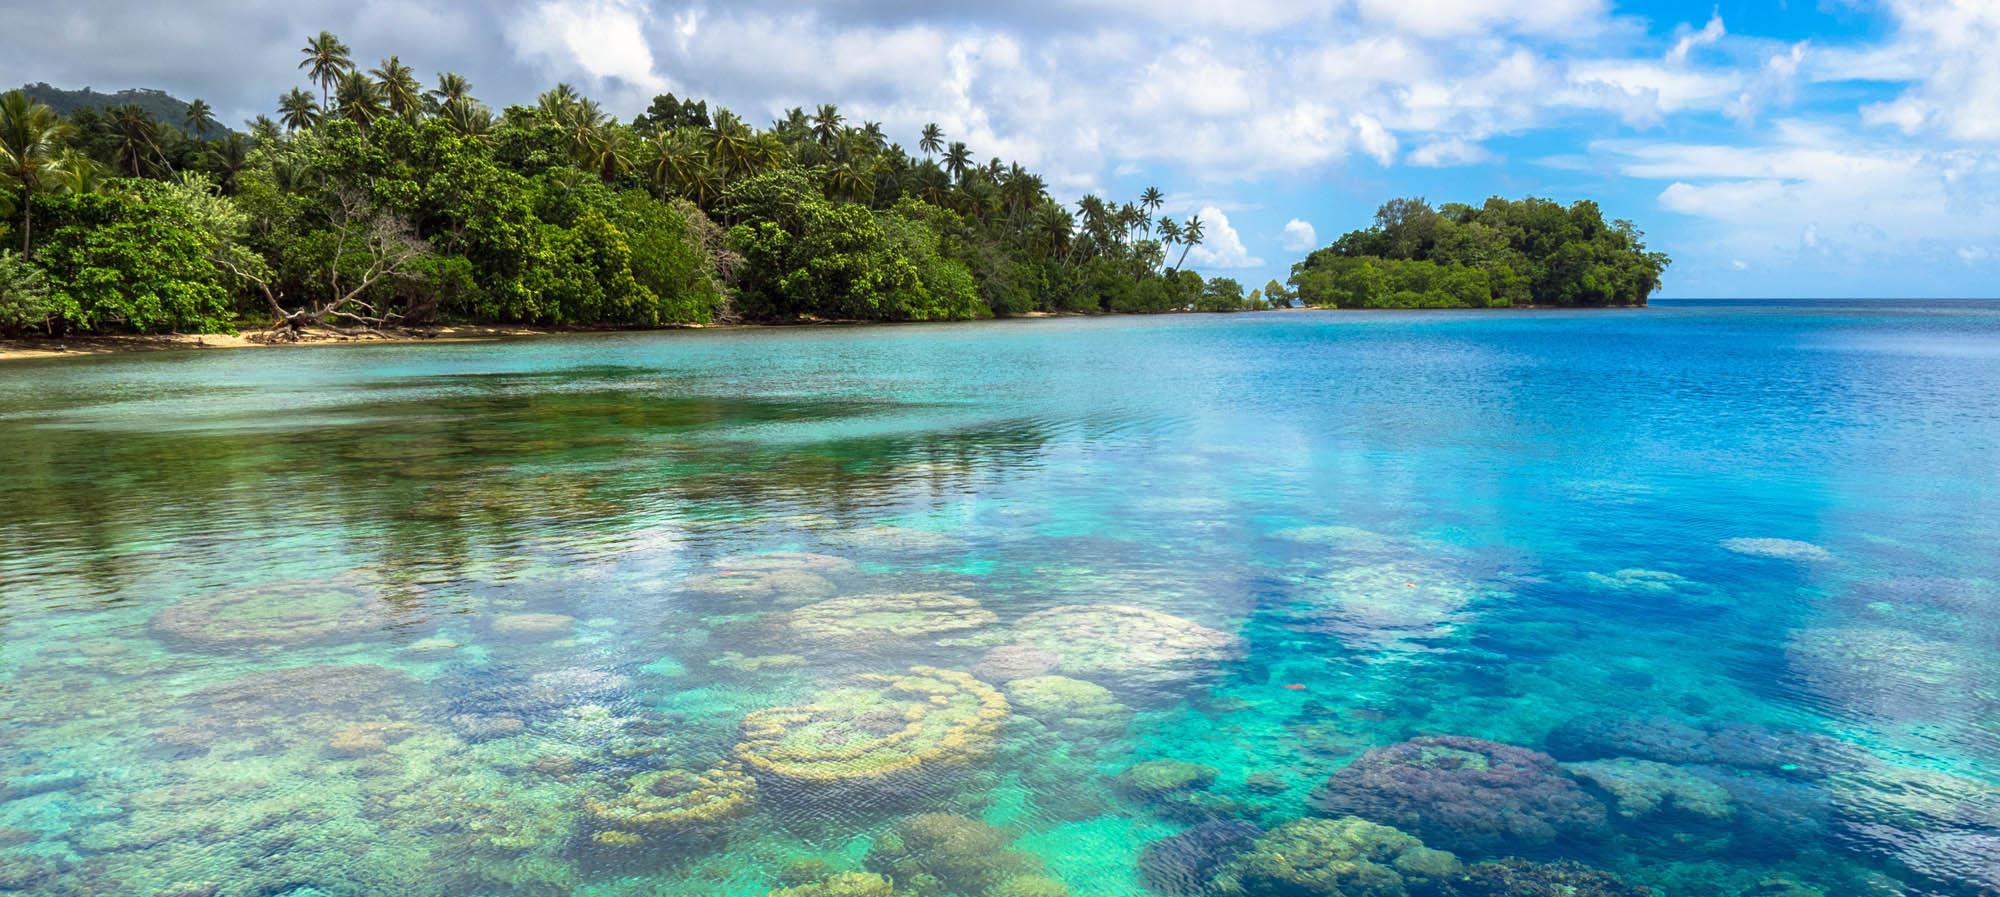 Papua New Guinea Wildlife Marine Life Rainforest Holiday Dive Birdwatching Snorkel Bird Of Paradise New Britain Ireland